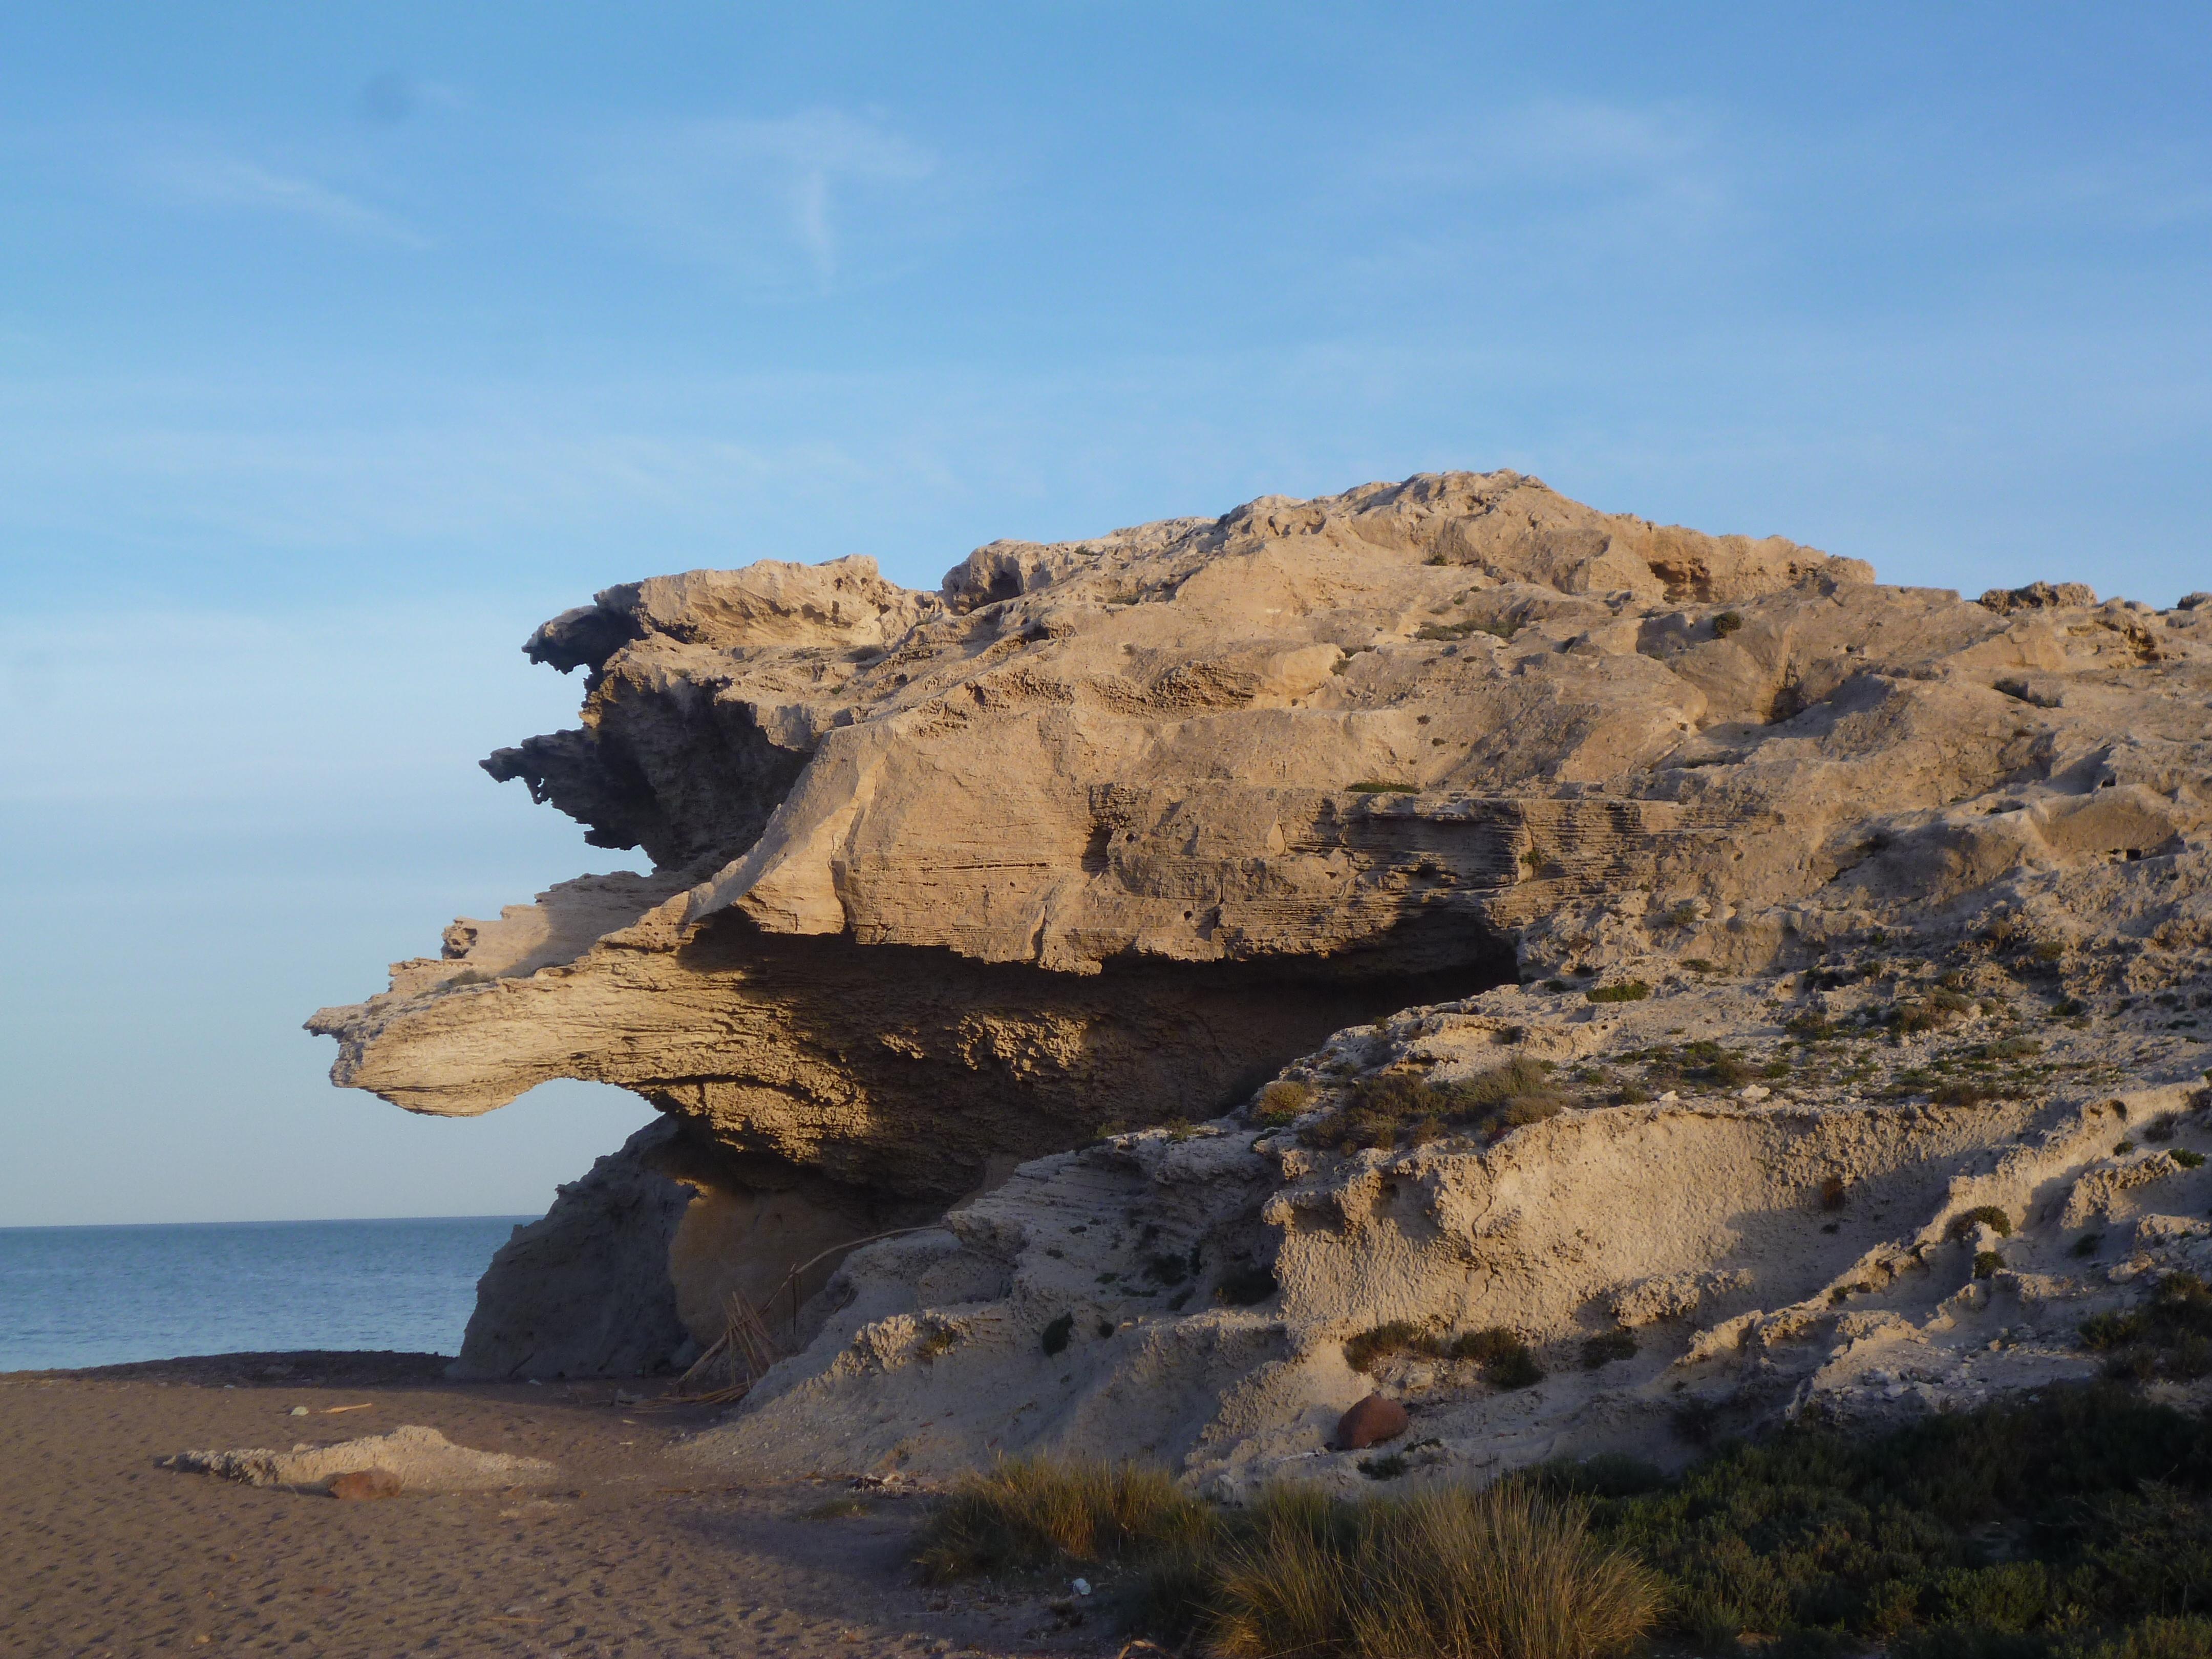 les fameuse dunes fossiles de Los Esculos